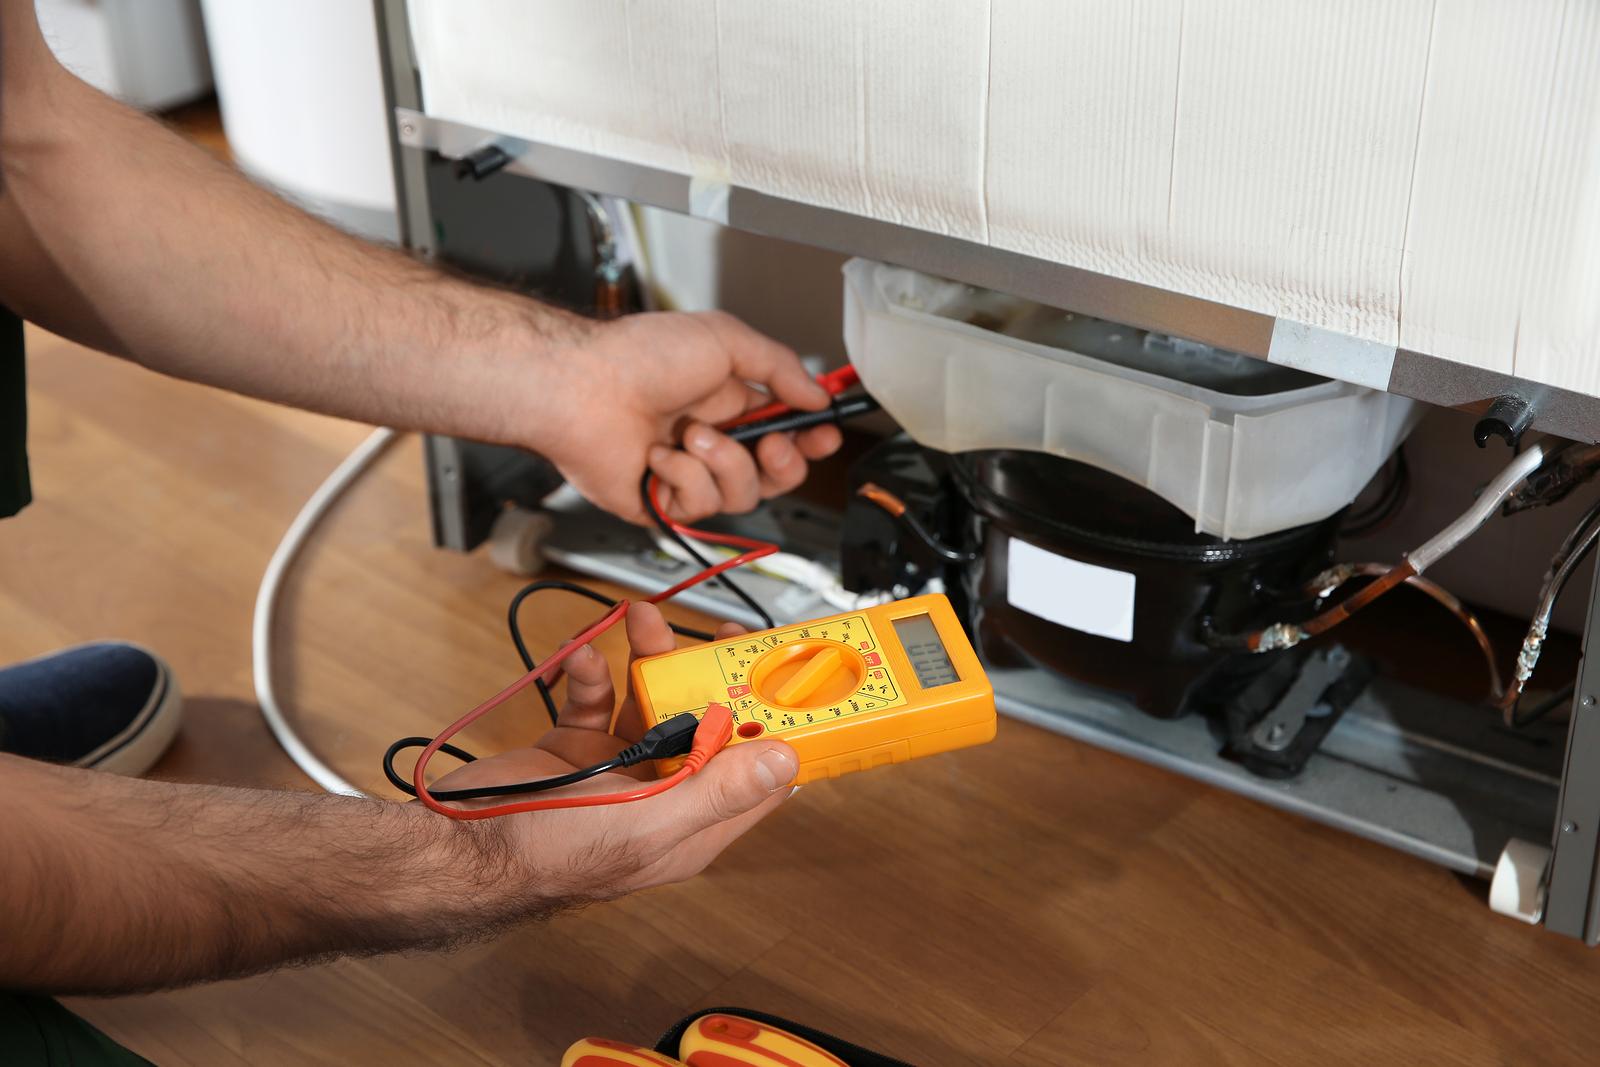 bigstock-Male-Technician-Repairing-Brok-280610956